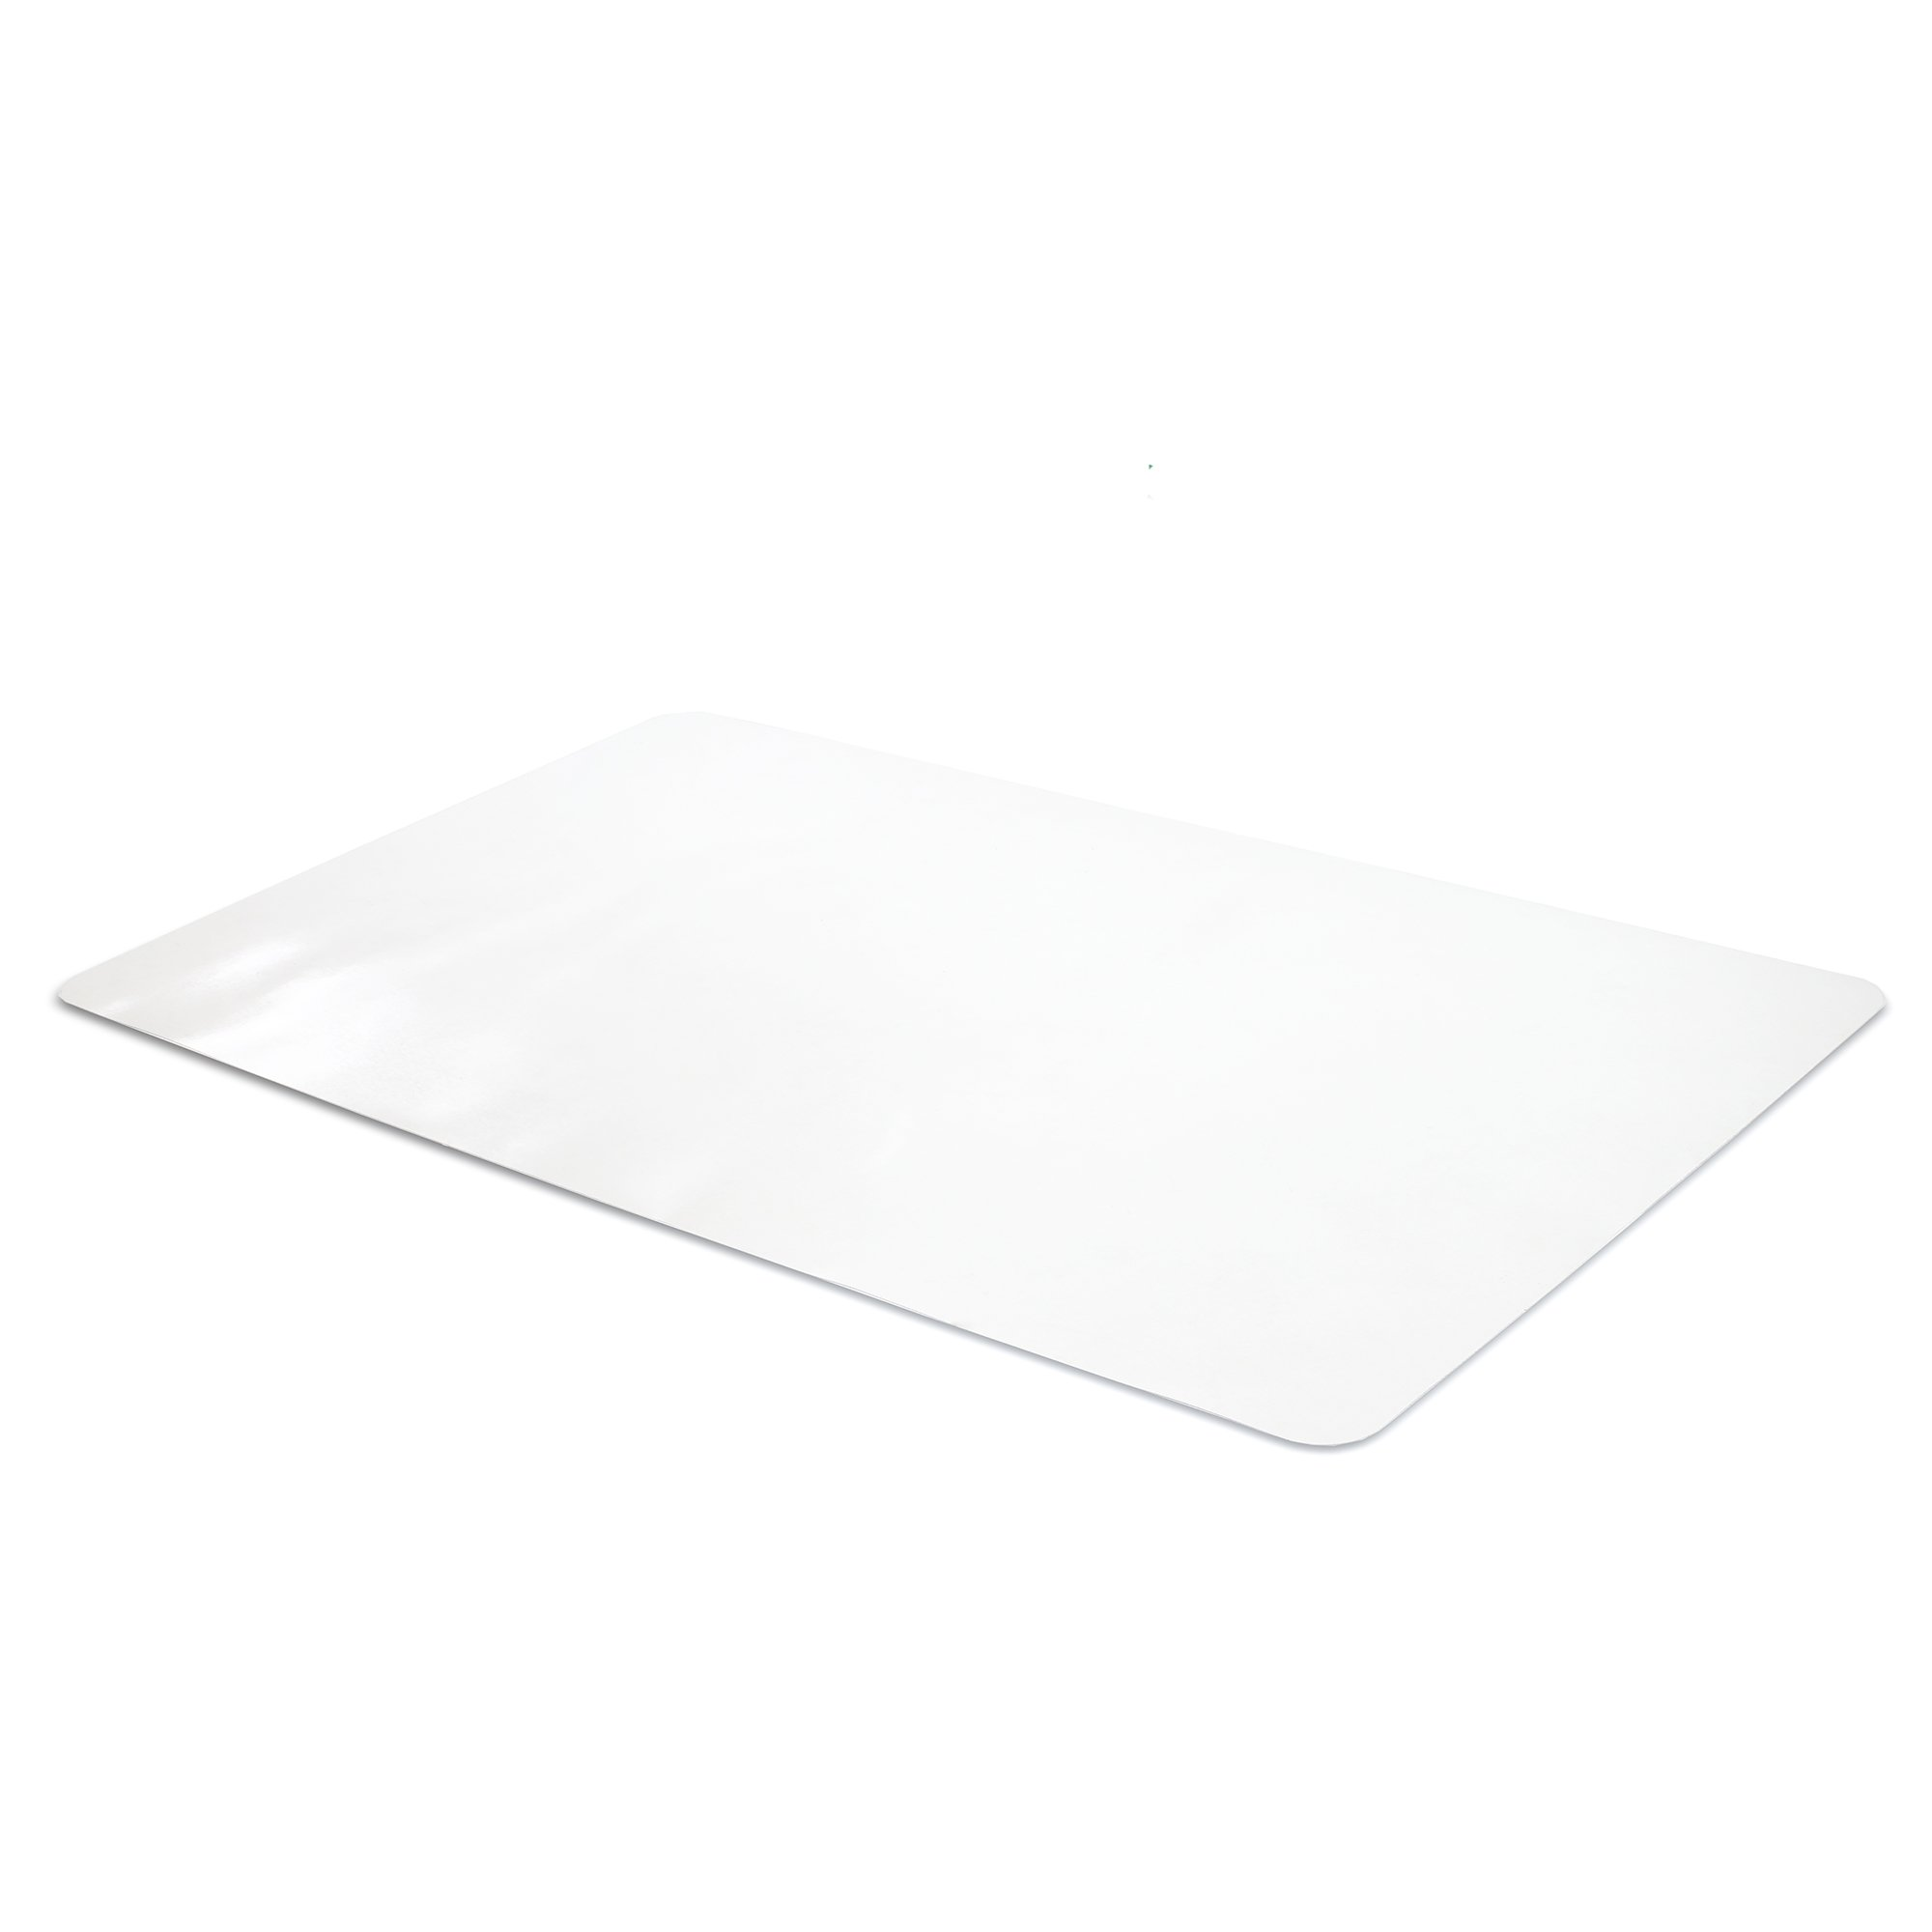 Office Desk Mat Clear Textured - 36 x 20 Inch Plastic Computer Mat for Desk